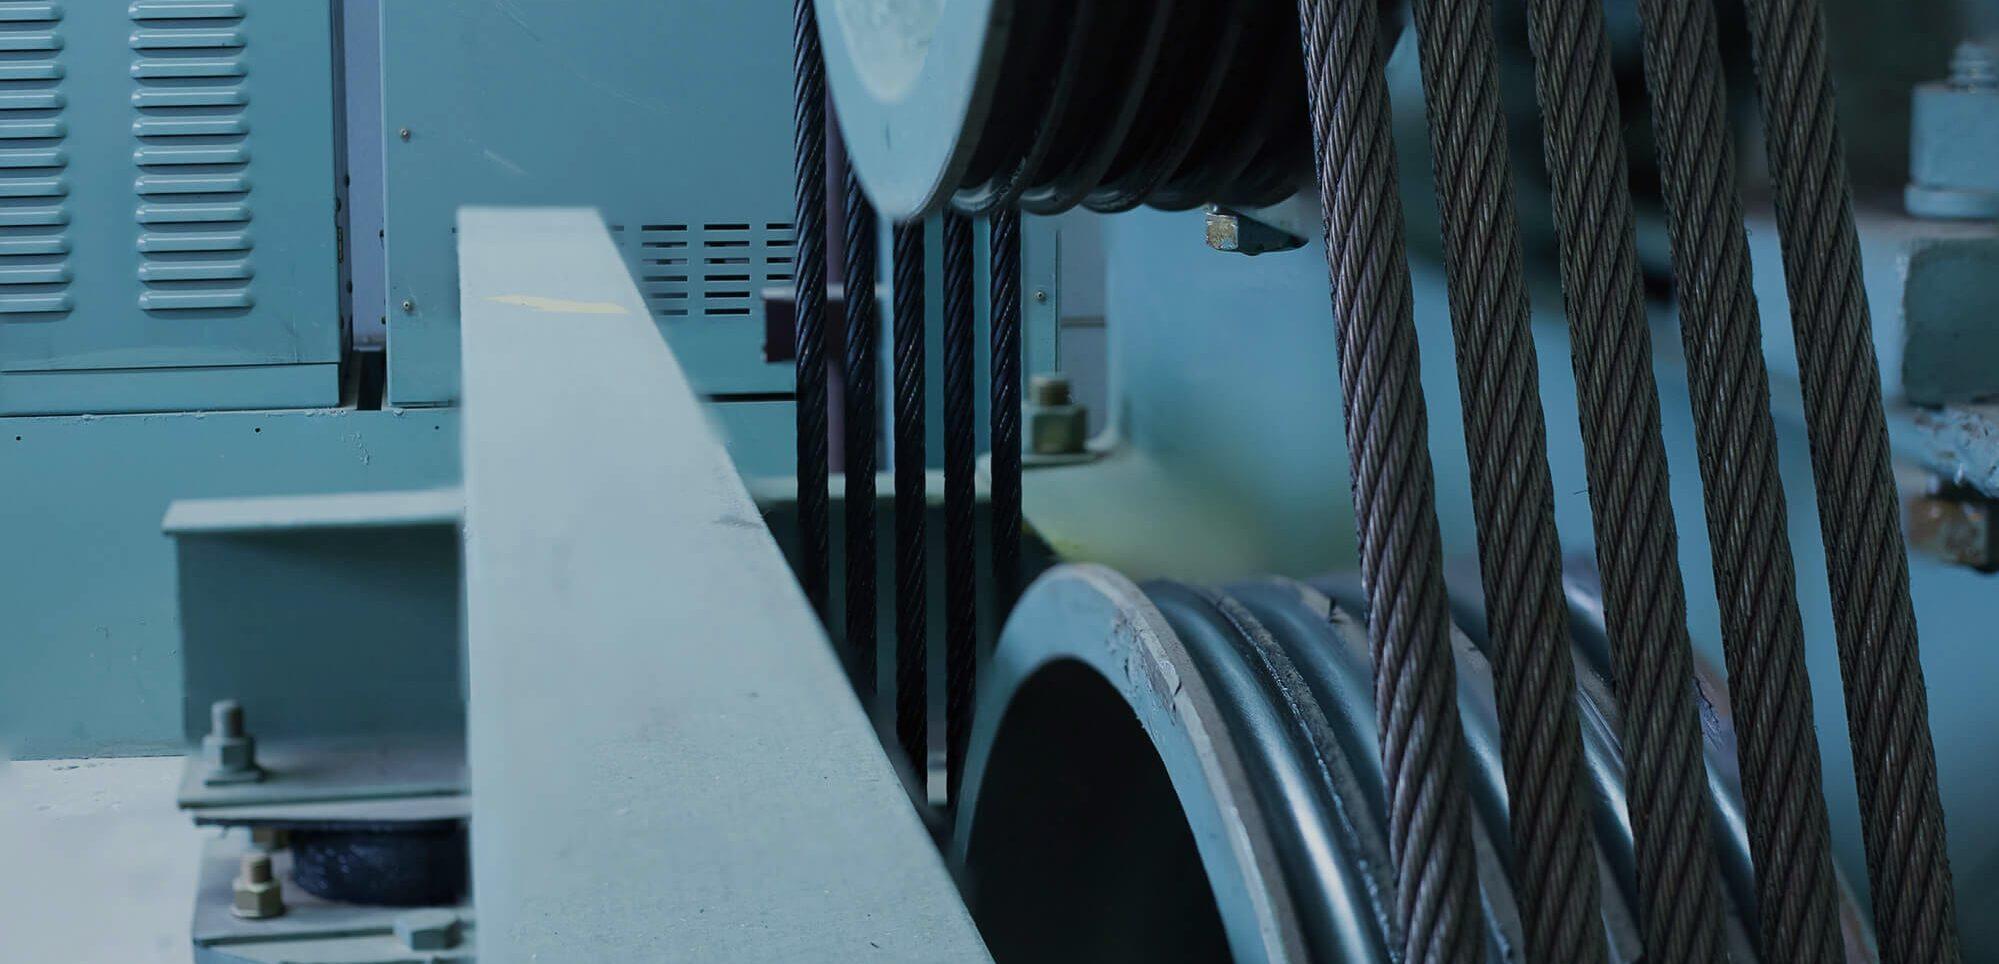 Repairing, Replacing, and Maintaining Industrial Elevator Equipment